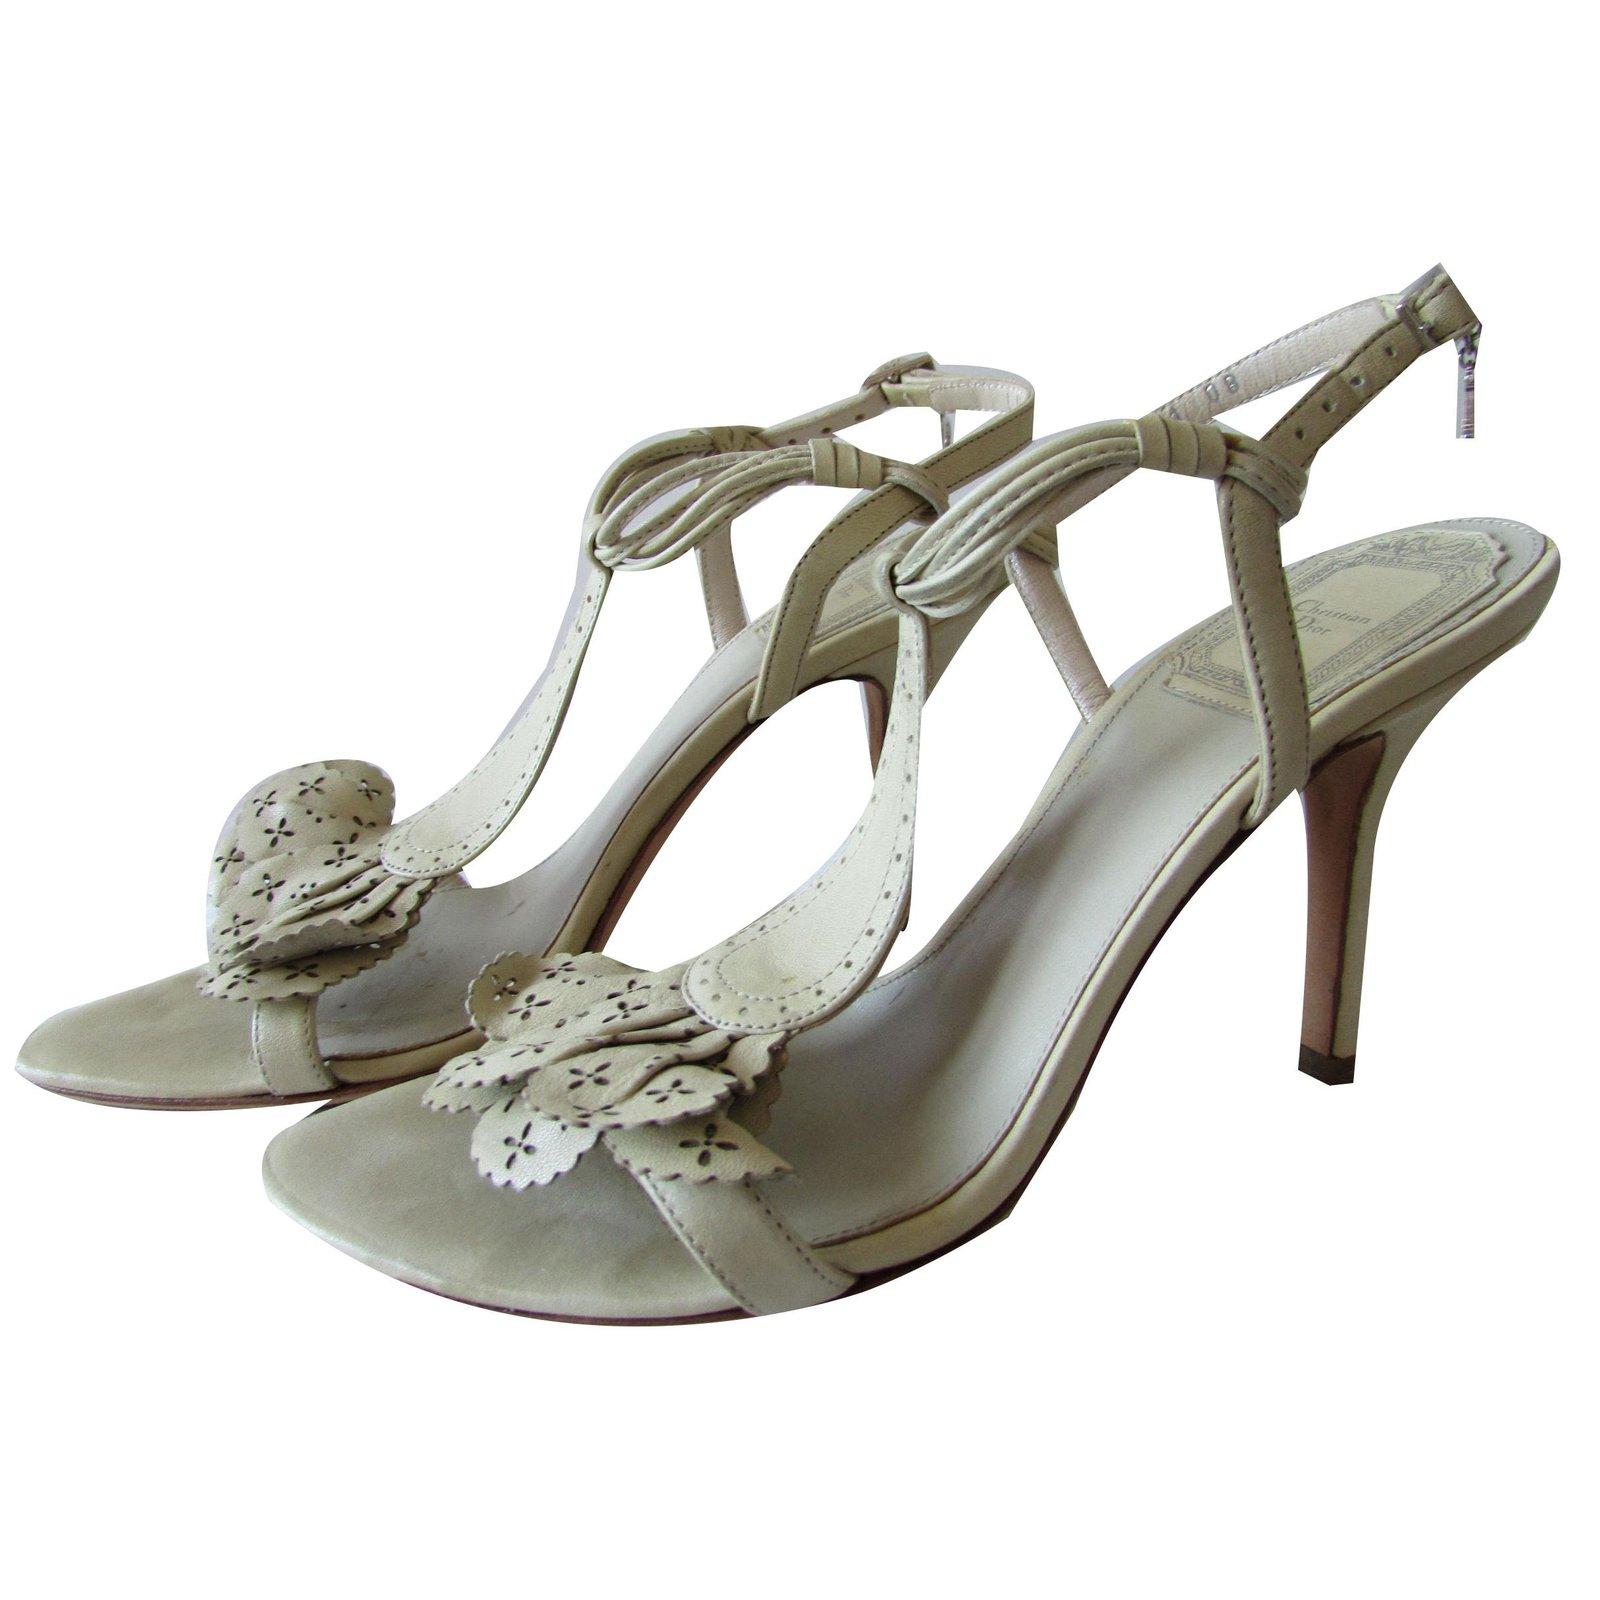 c2554ed23e6 Christian Dior Heels Heels Leather Beige ref.72899 - Joli Closet